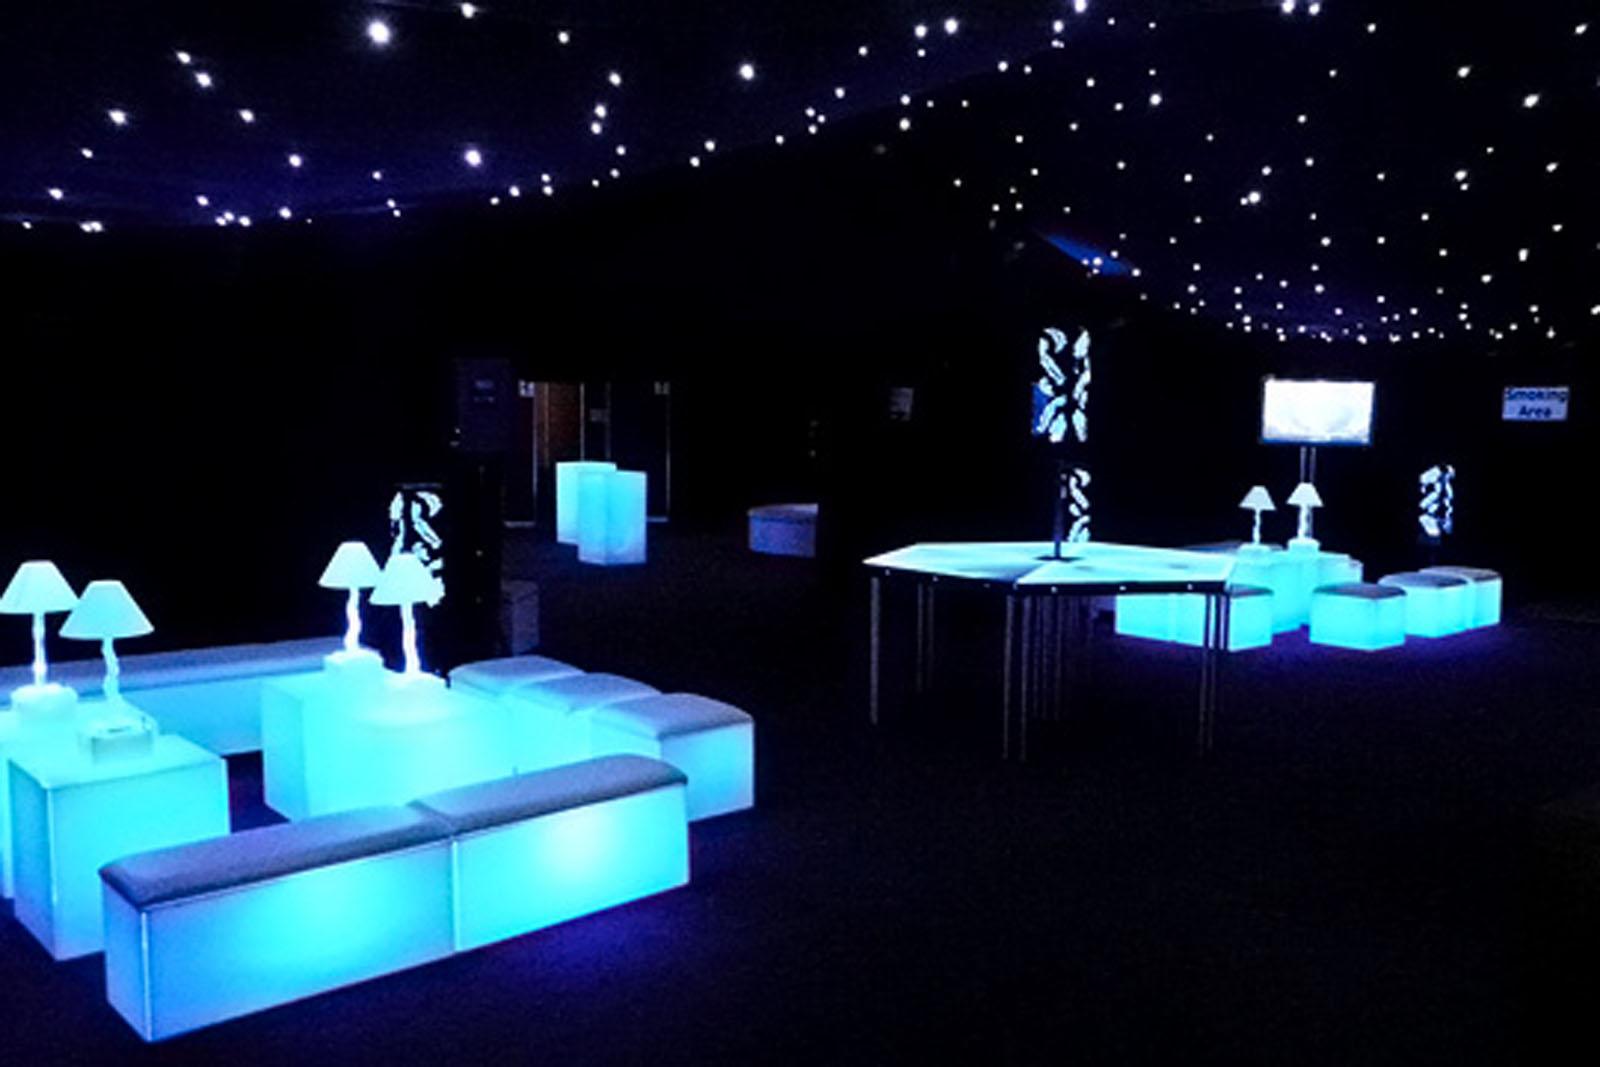 LED Leunge Furniture 2